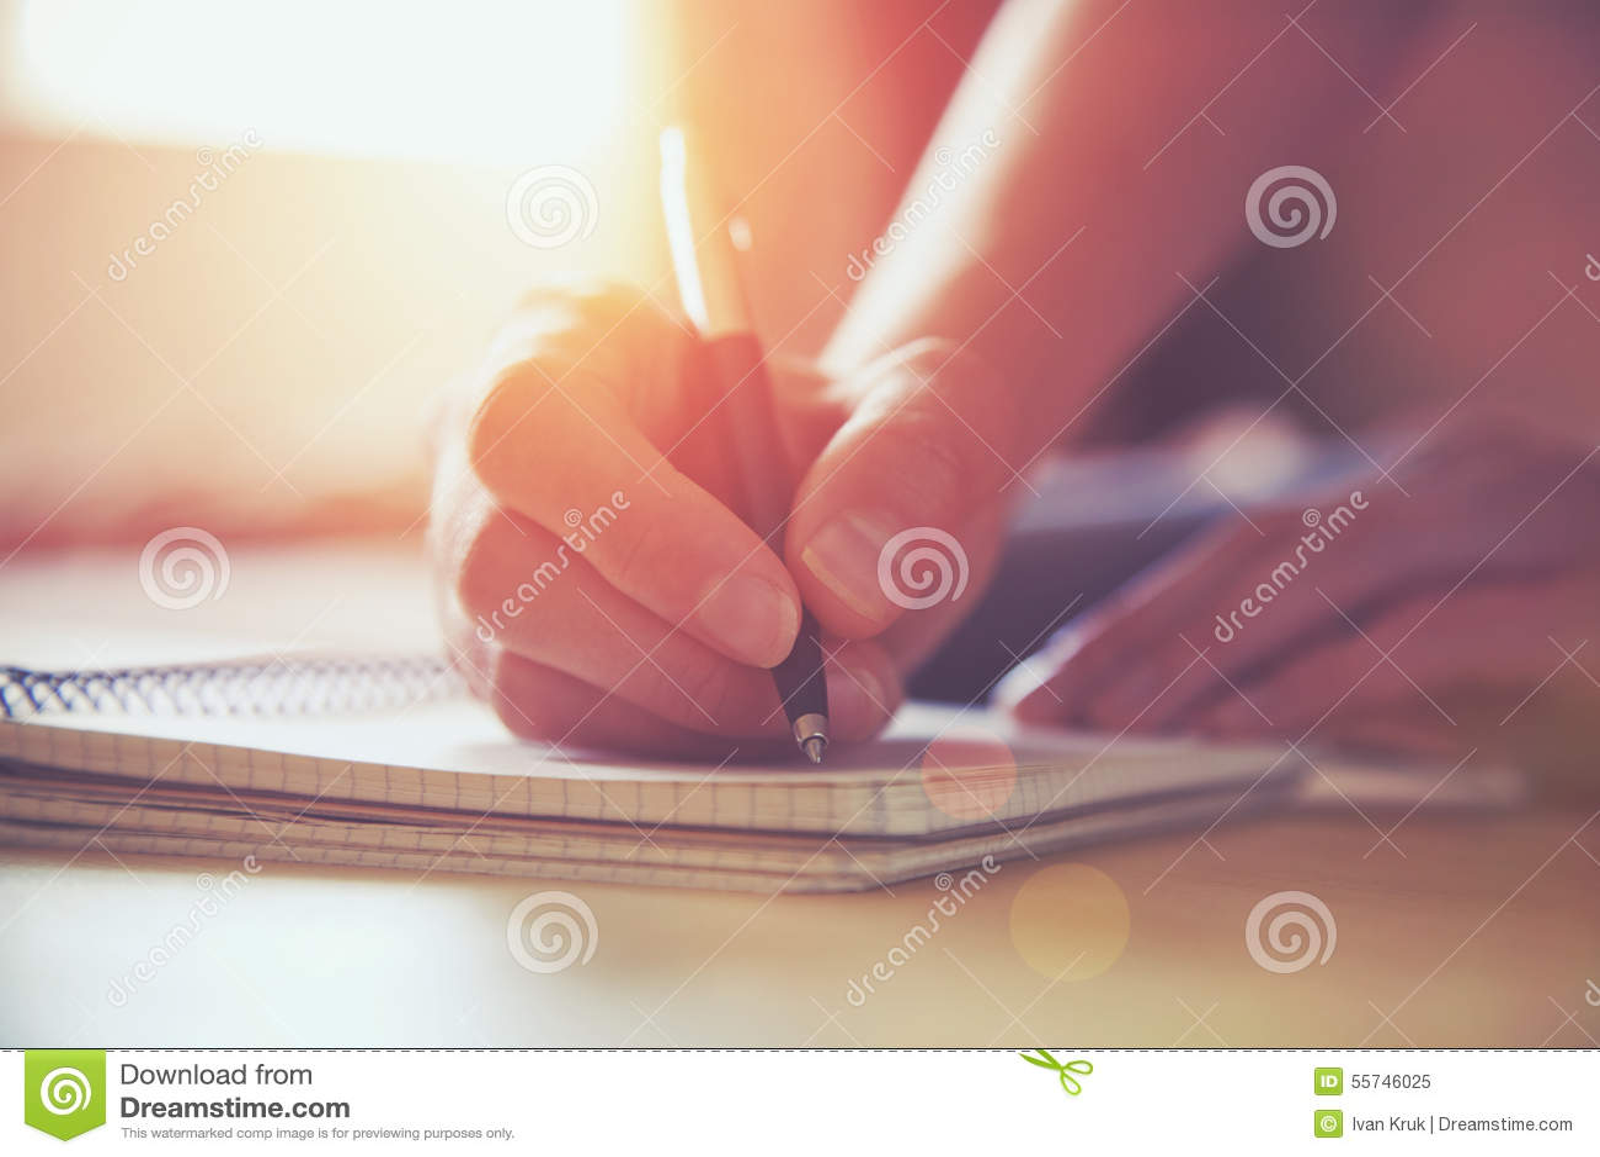 Руки с сочинительством ручки на тетради